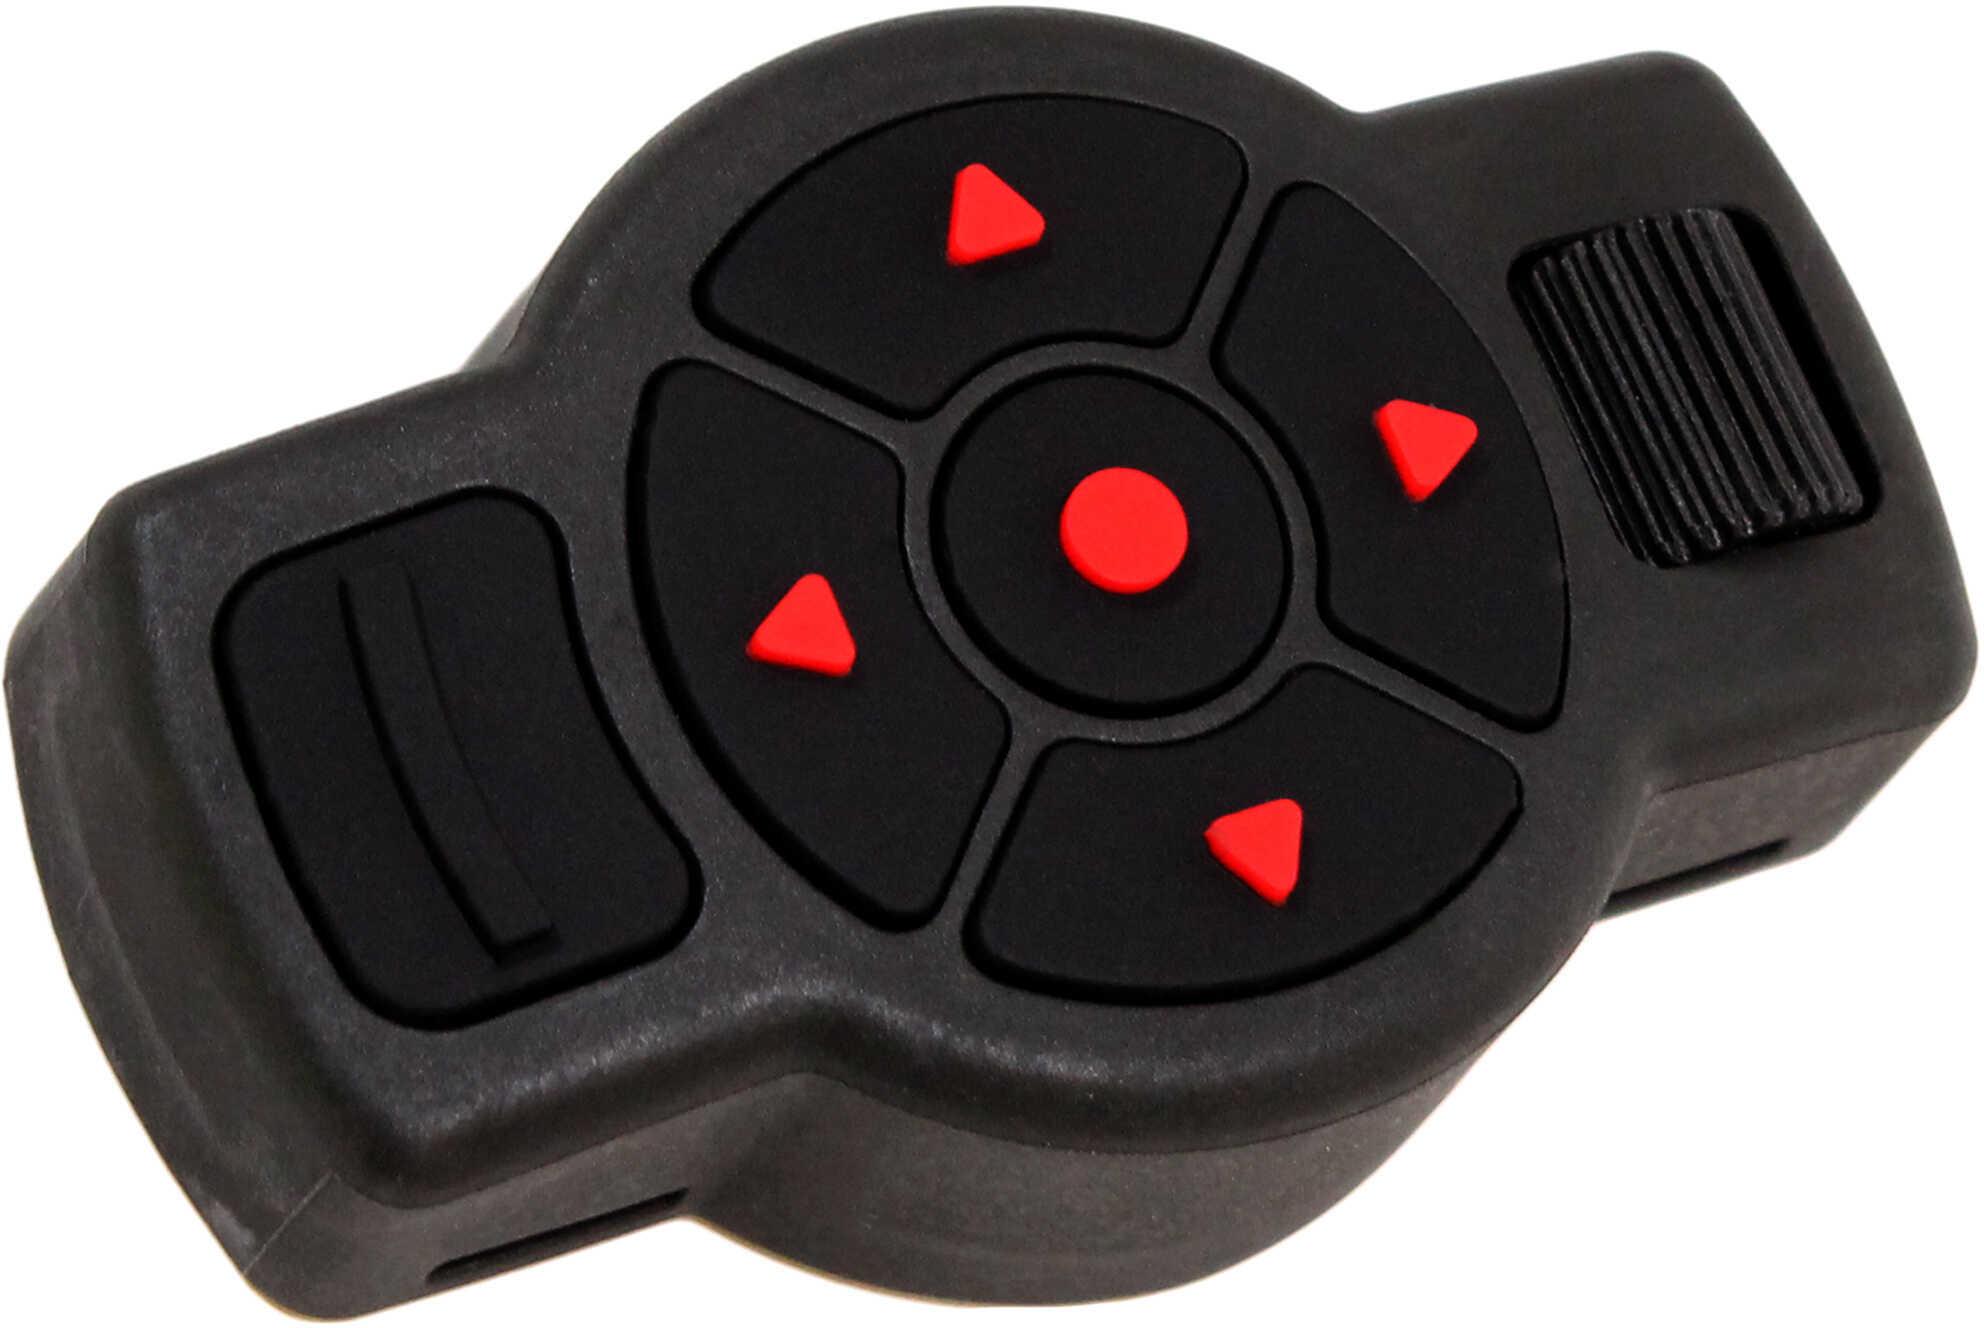 ATN Remote Control BLUETOOTH